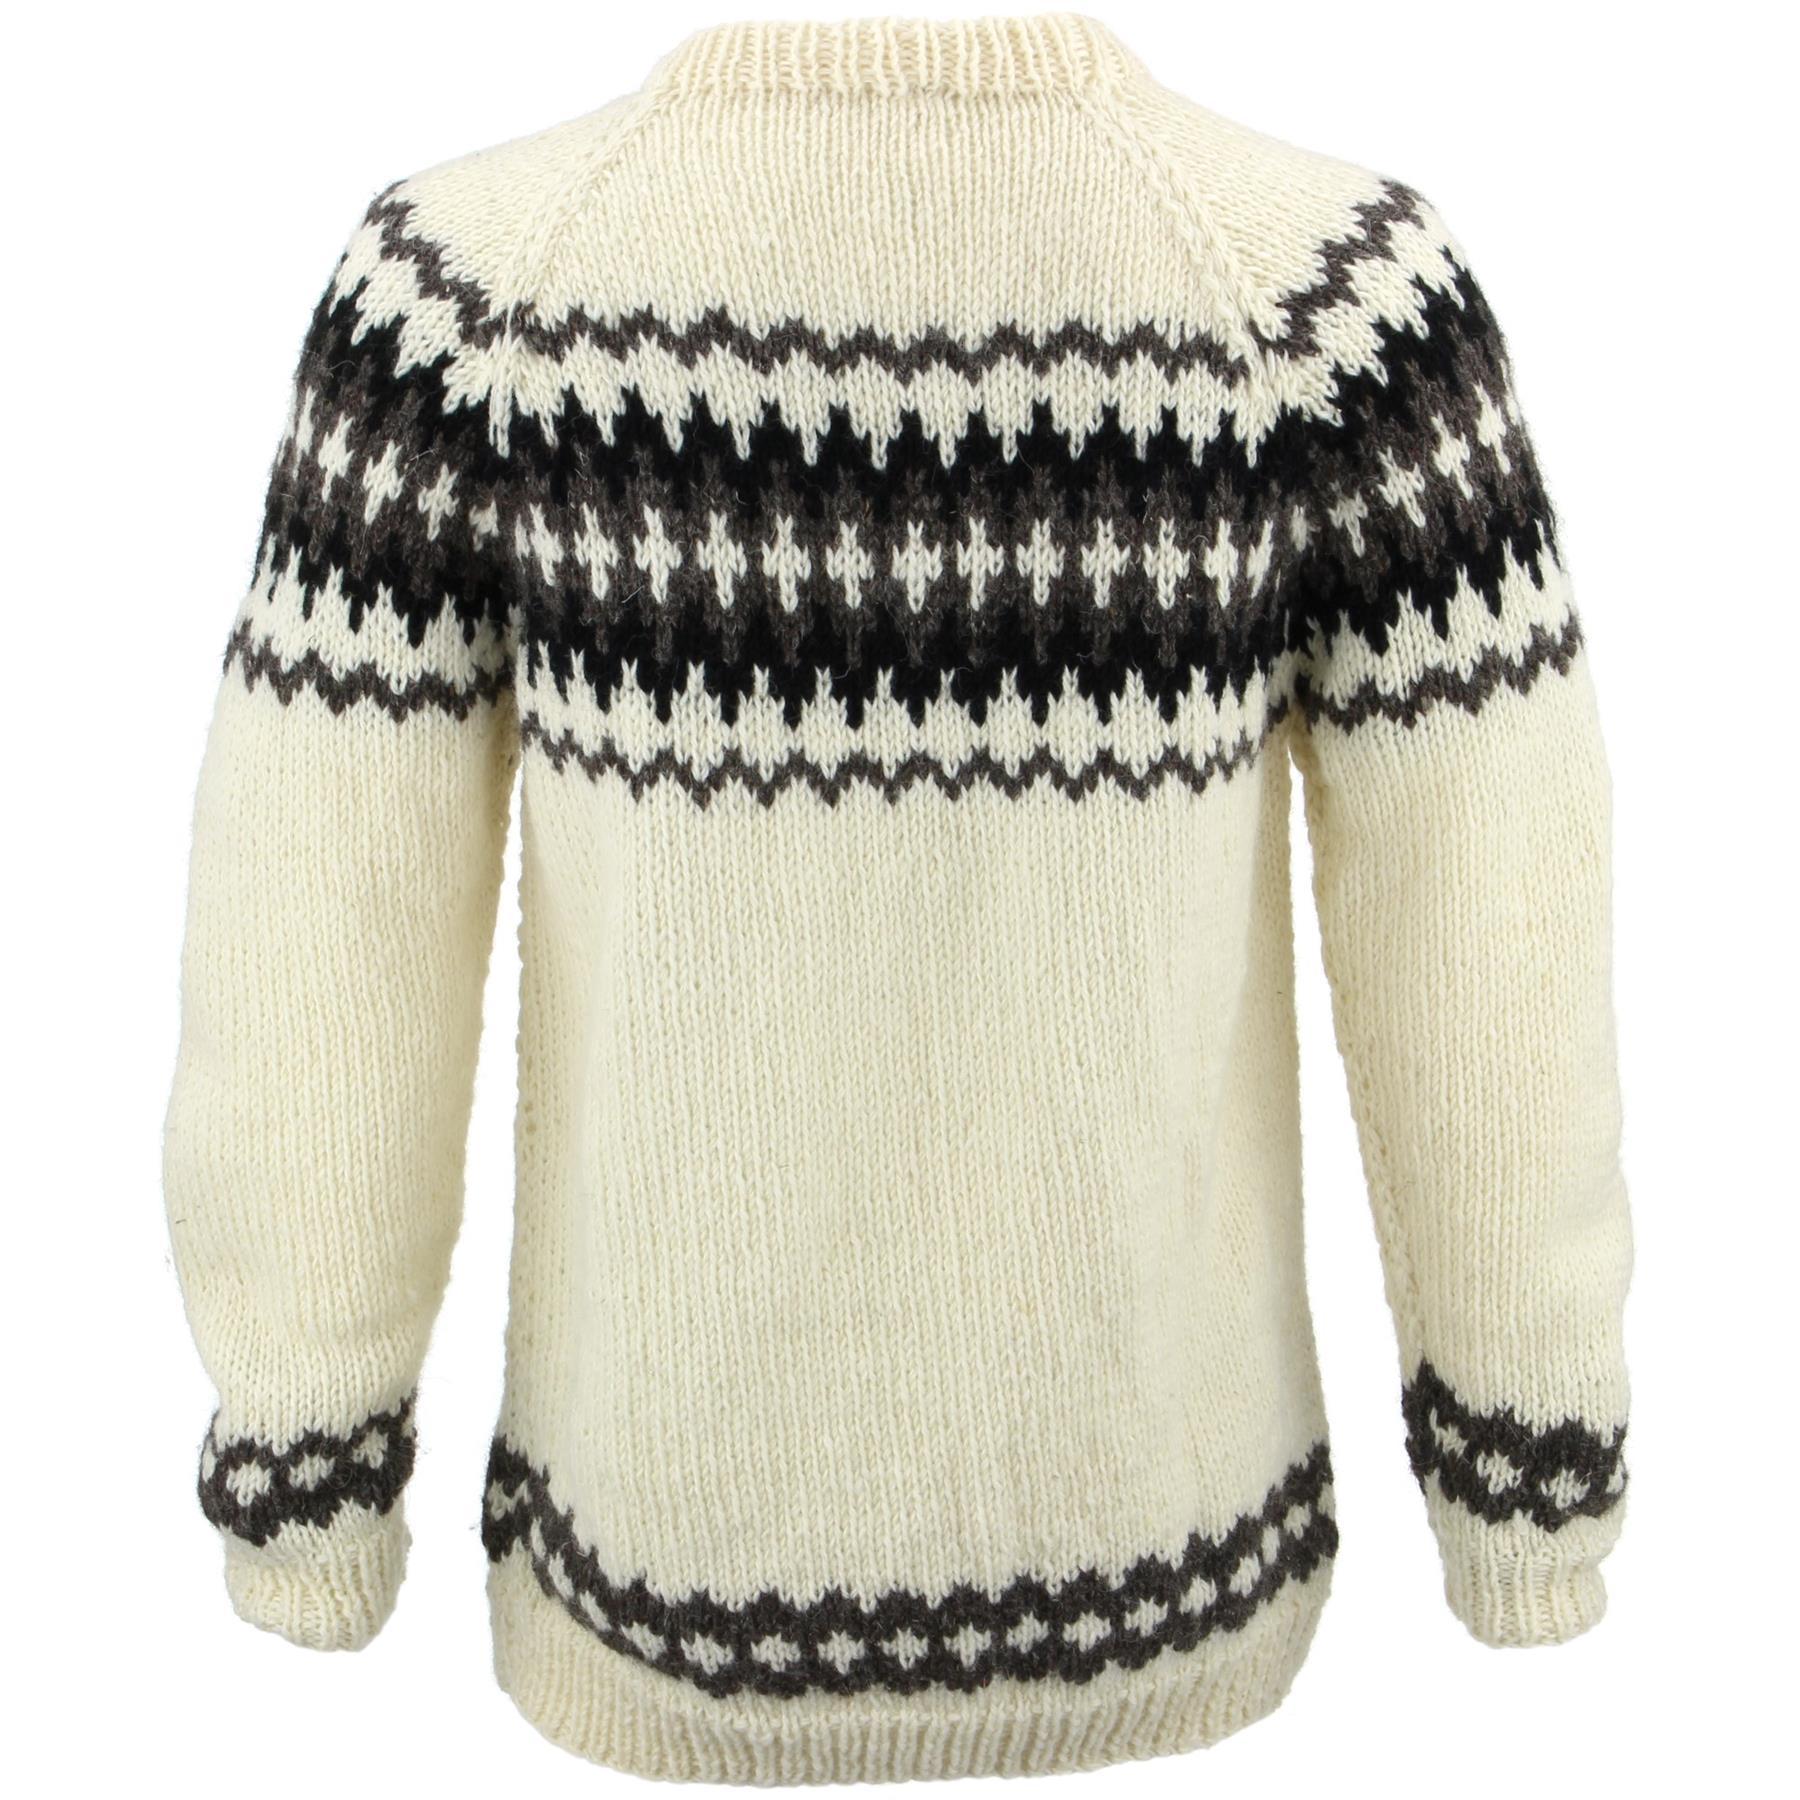 thumbnail 25 - Wool Knit Jumper Sweater Pullover Fairisle Nordic Abstract Warm Nepal Loose